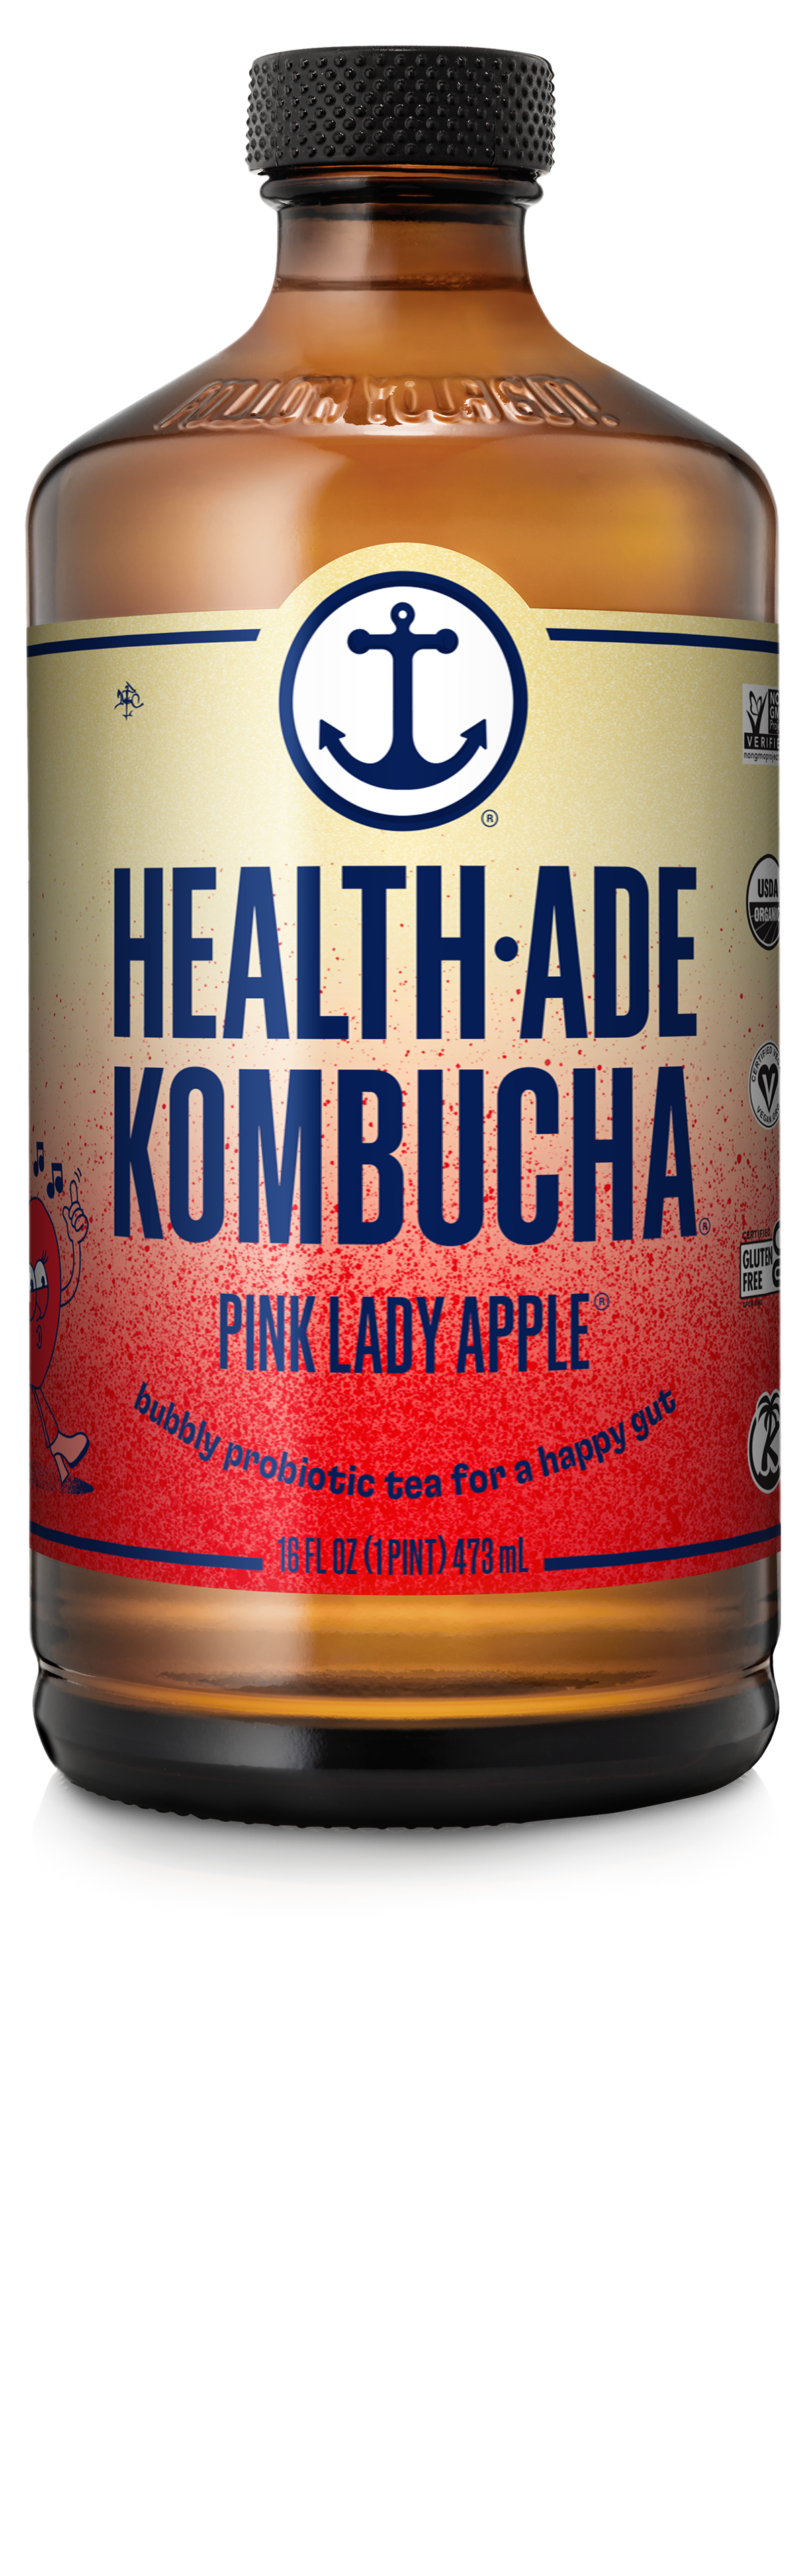 Health-Ade Kombucha Pink Lady Apple